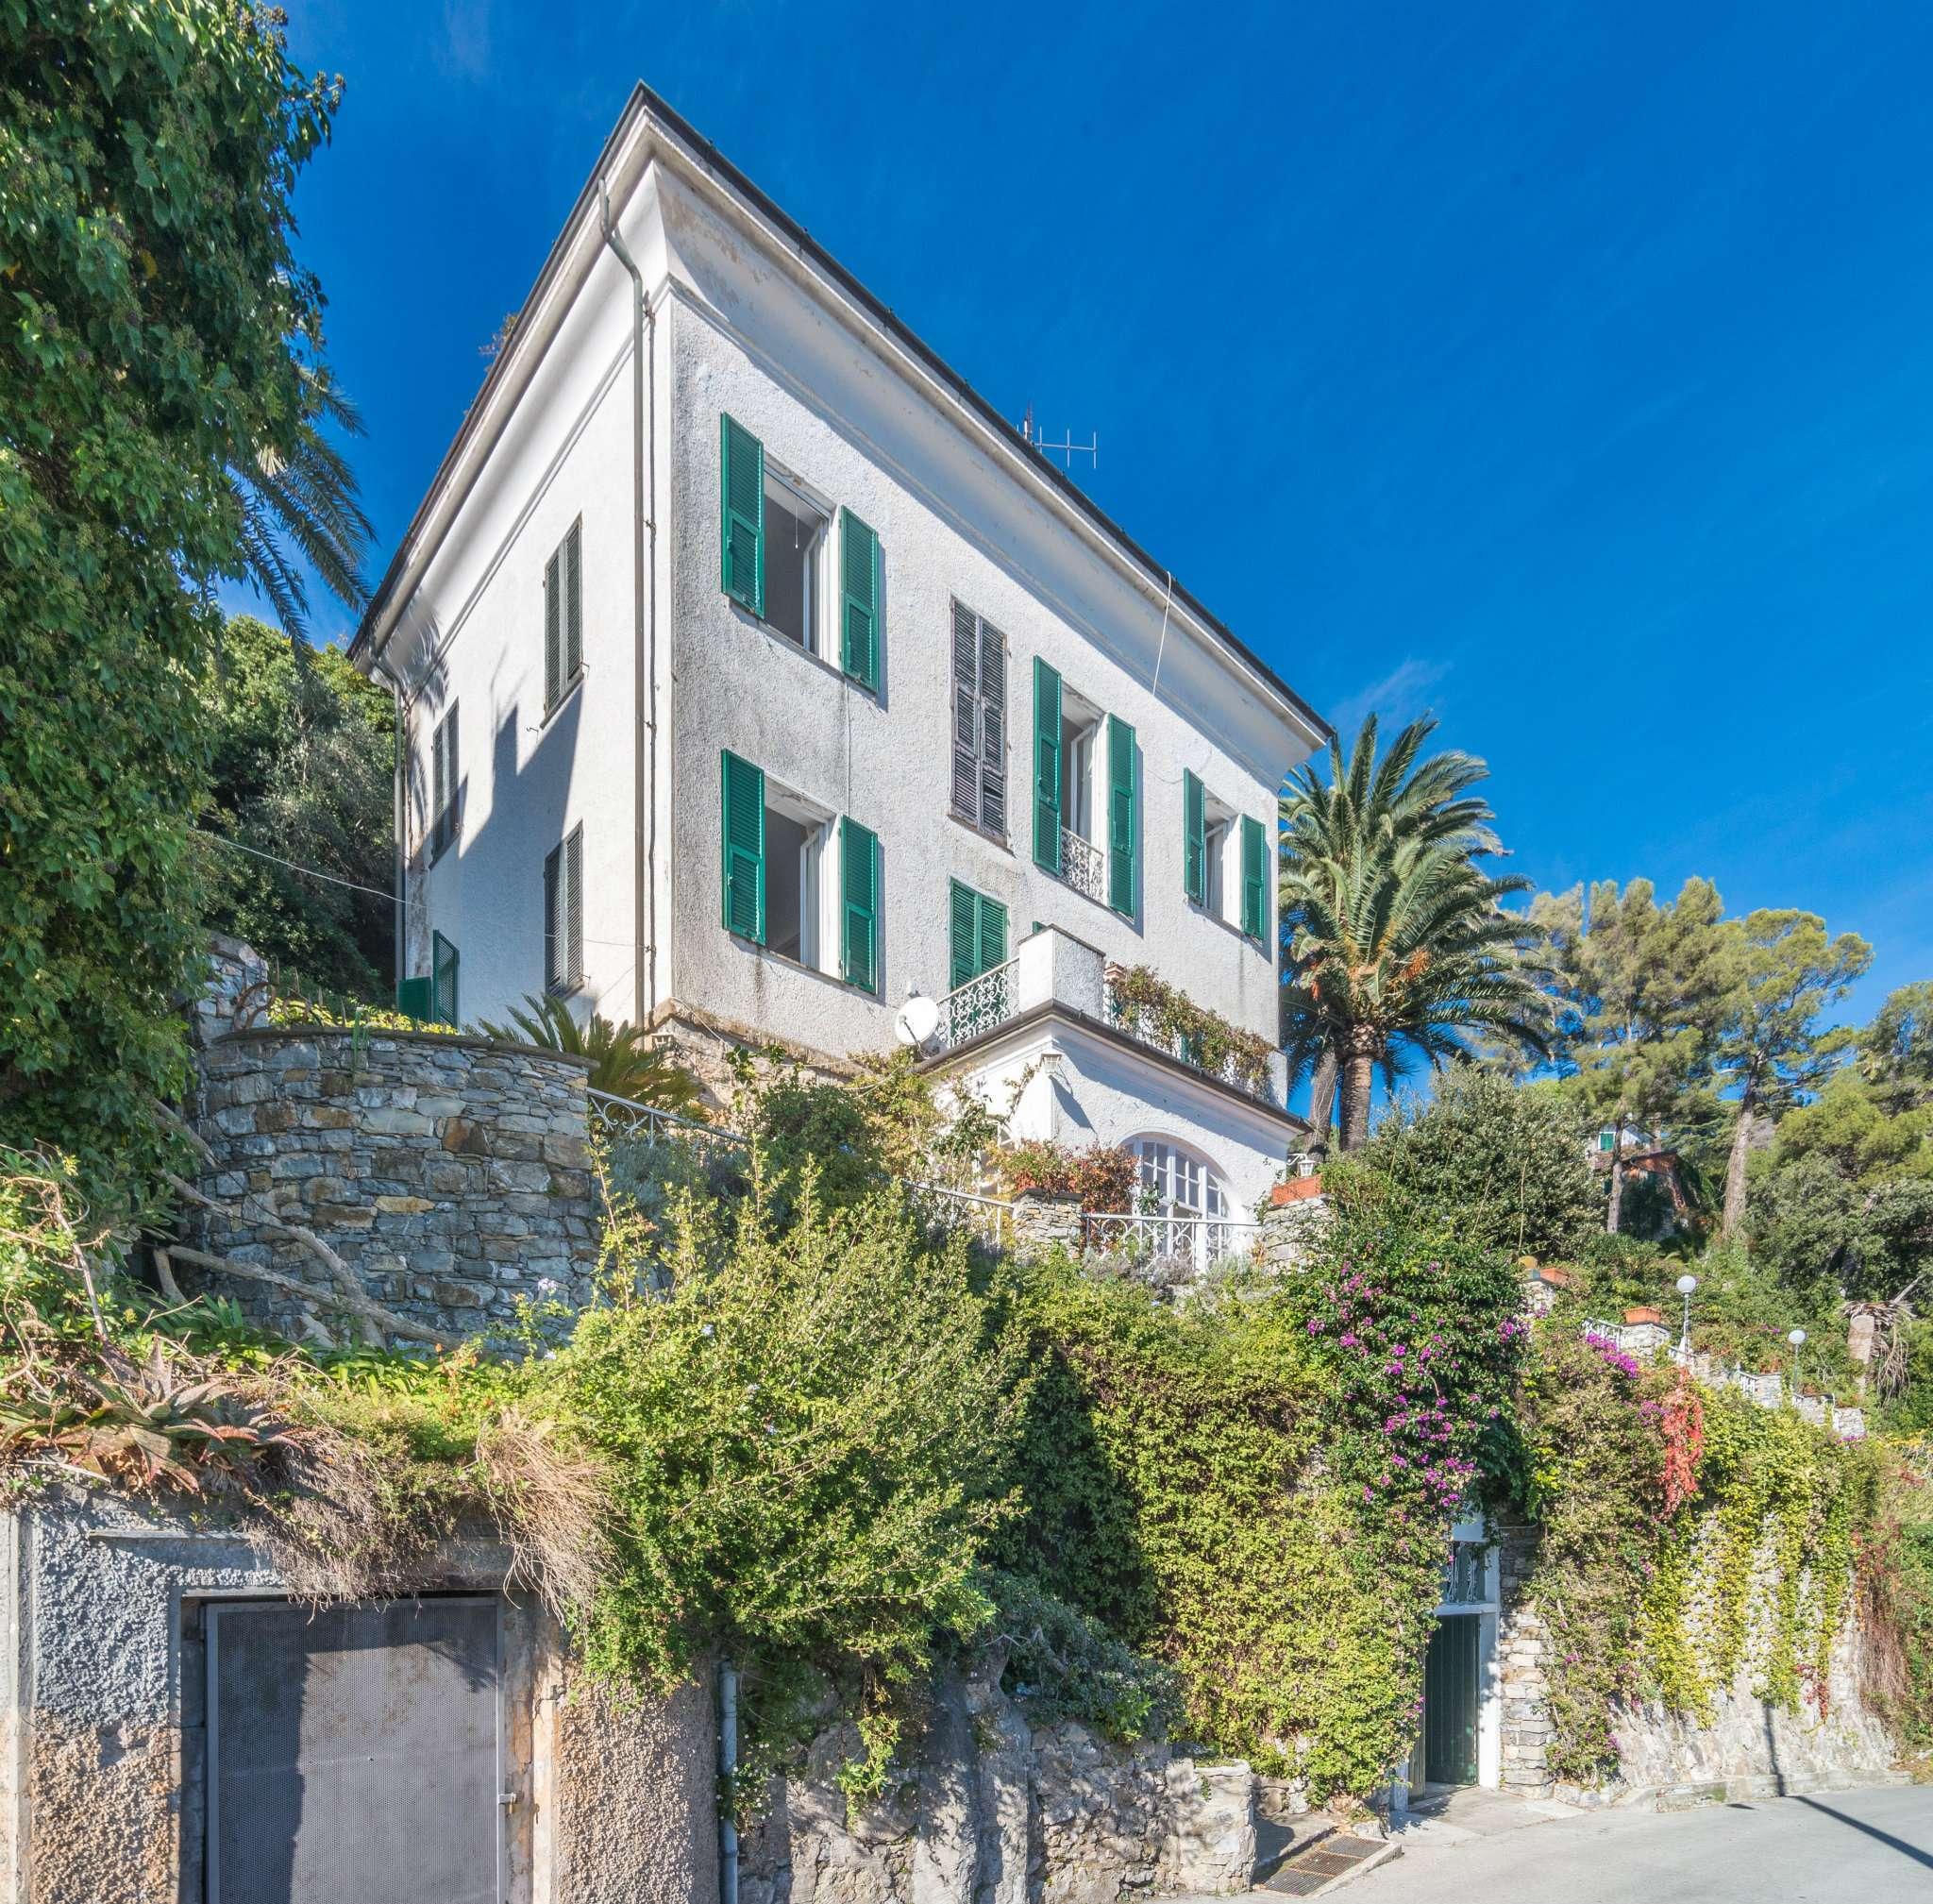 Villa in Vendita a Santa Margherita Ligure: 5 locali, 545 mq - Foto 11